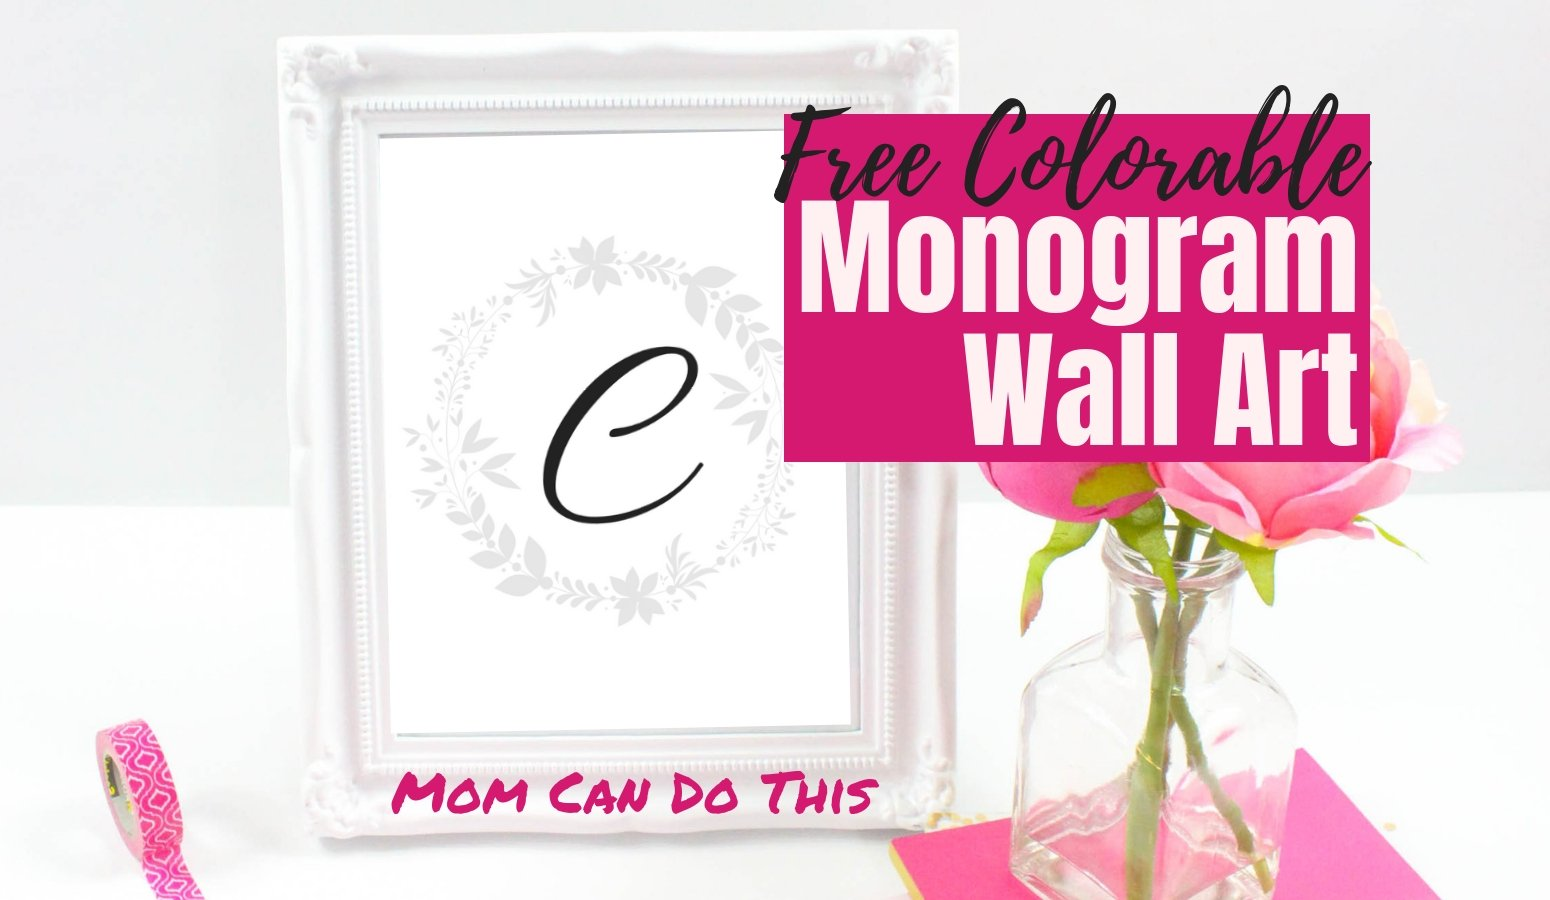 Free Printable Monogram Wall Art - Colorable!